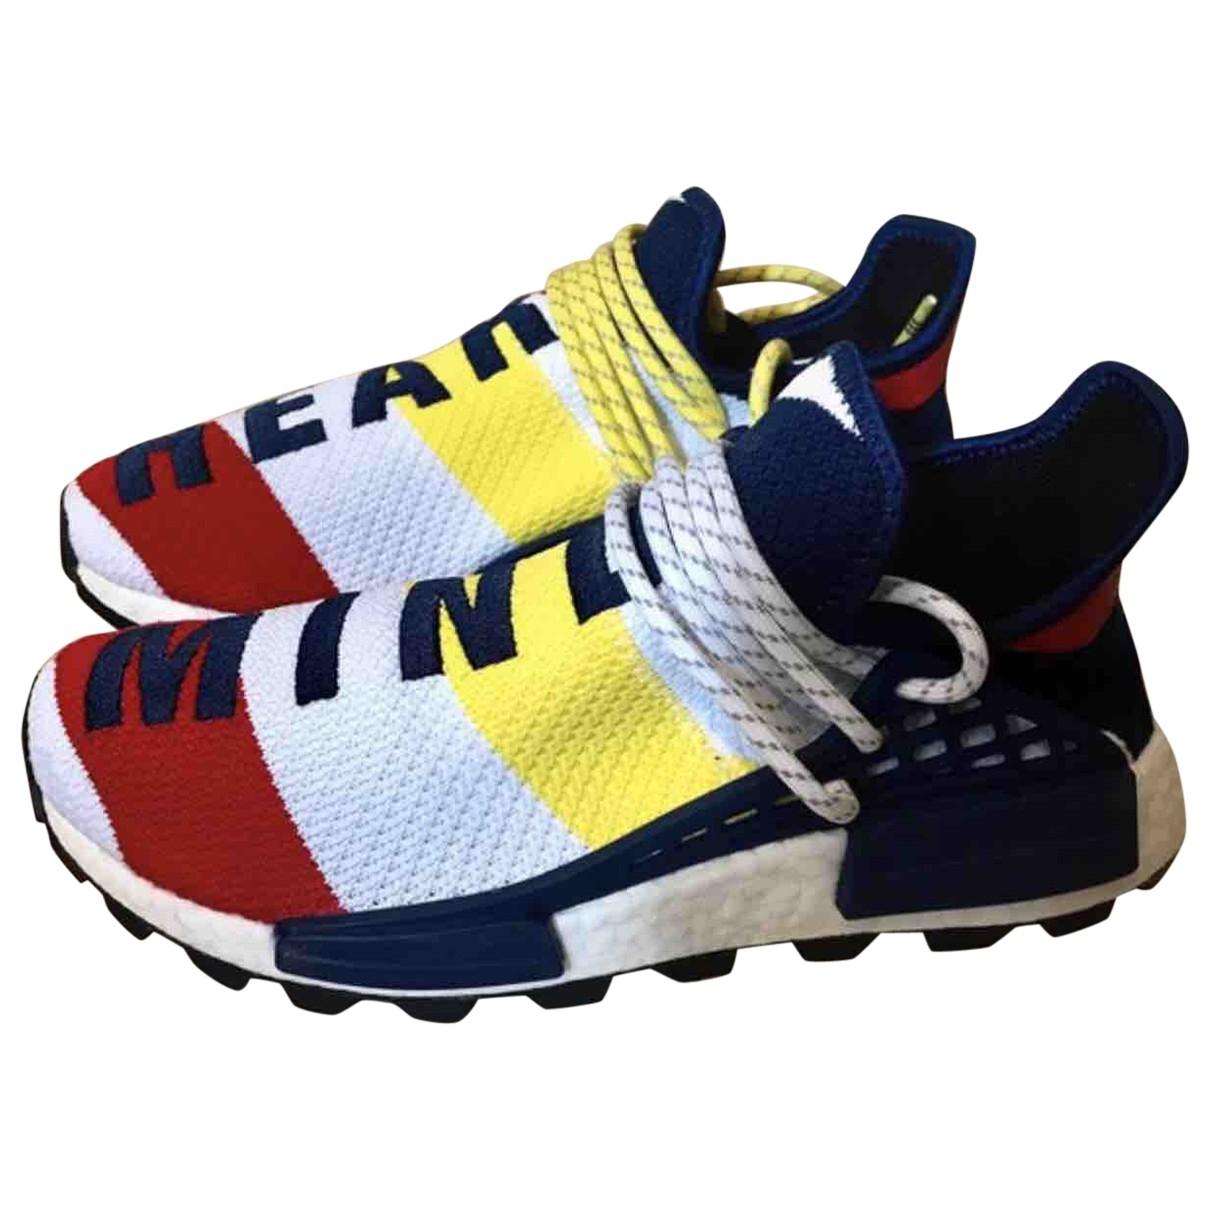 Adidas X Pharrell Williams NMD Hu Multicolour Trainers for Men 40.5 EU